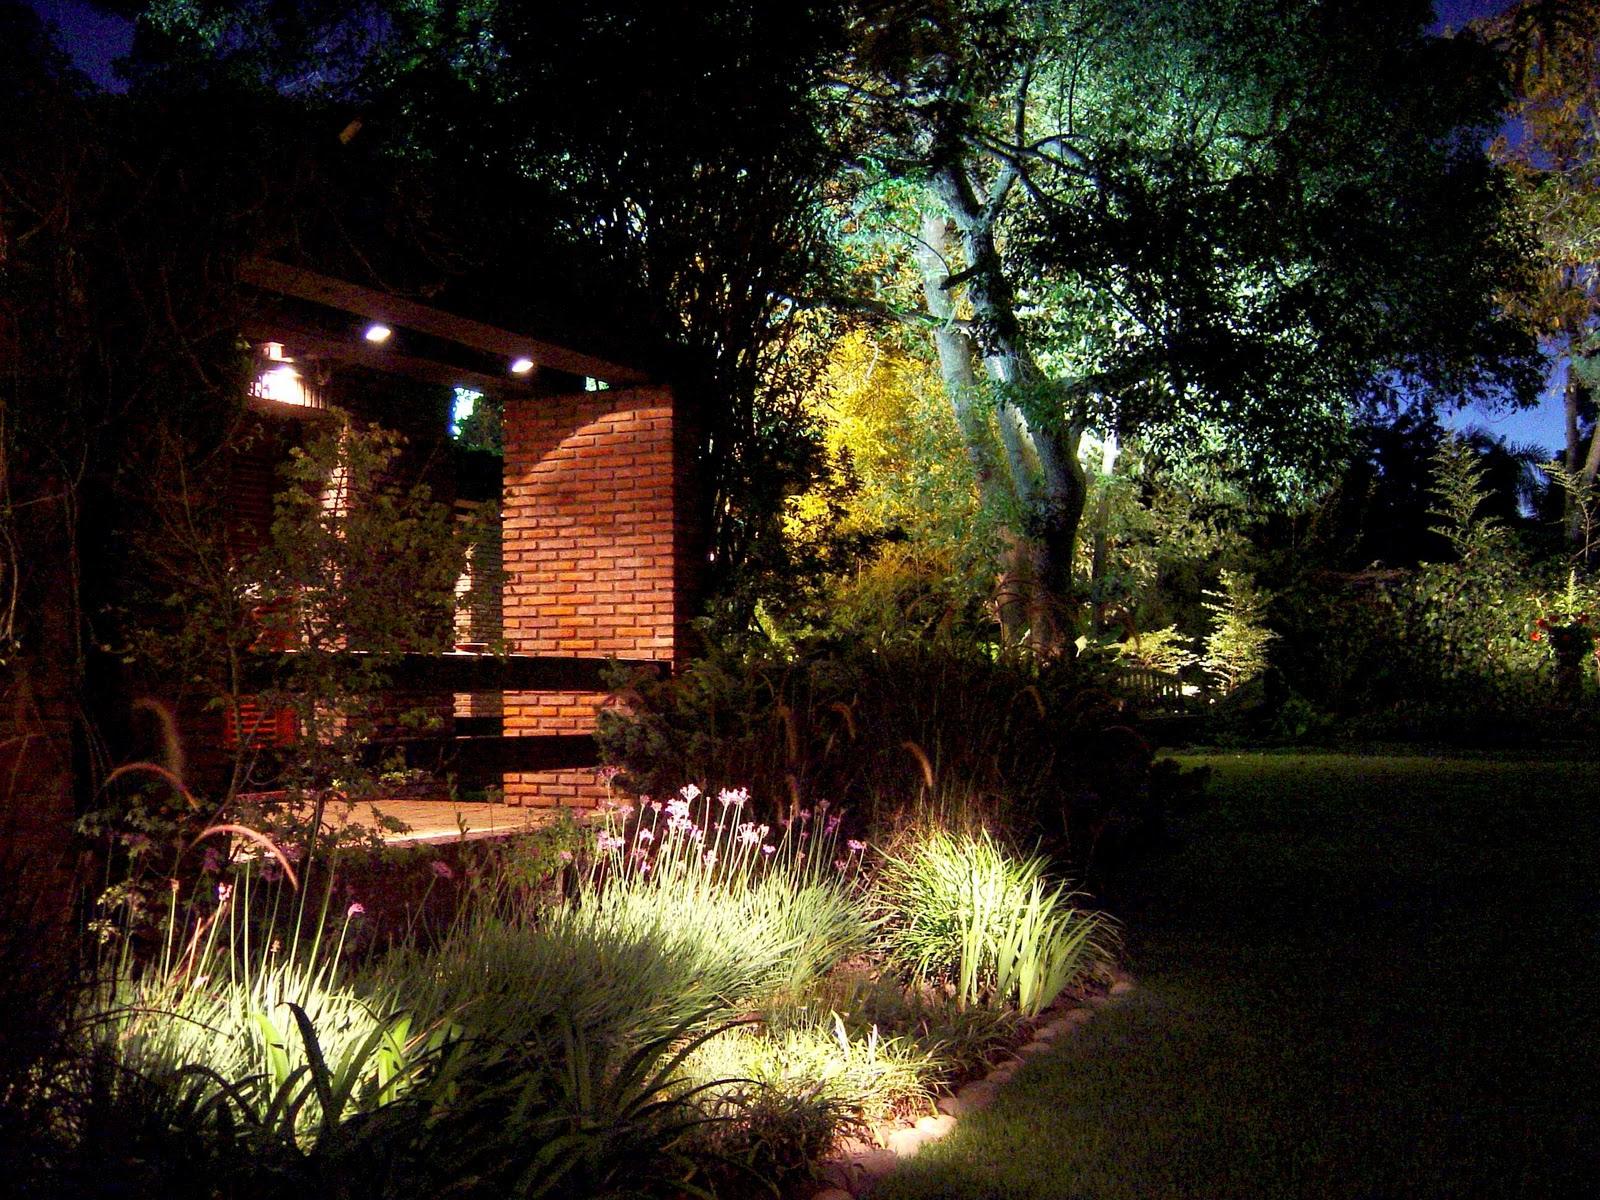 Iluminacion e p s i iluminacion de parques y jardines for Parques y jardines